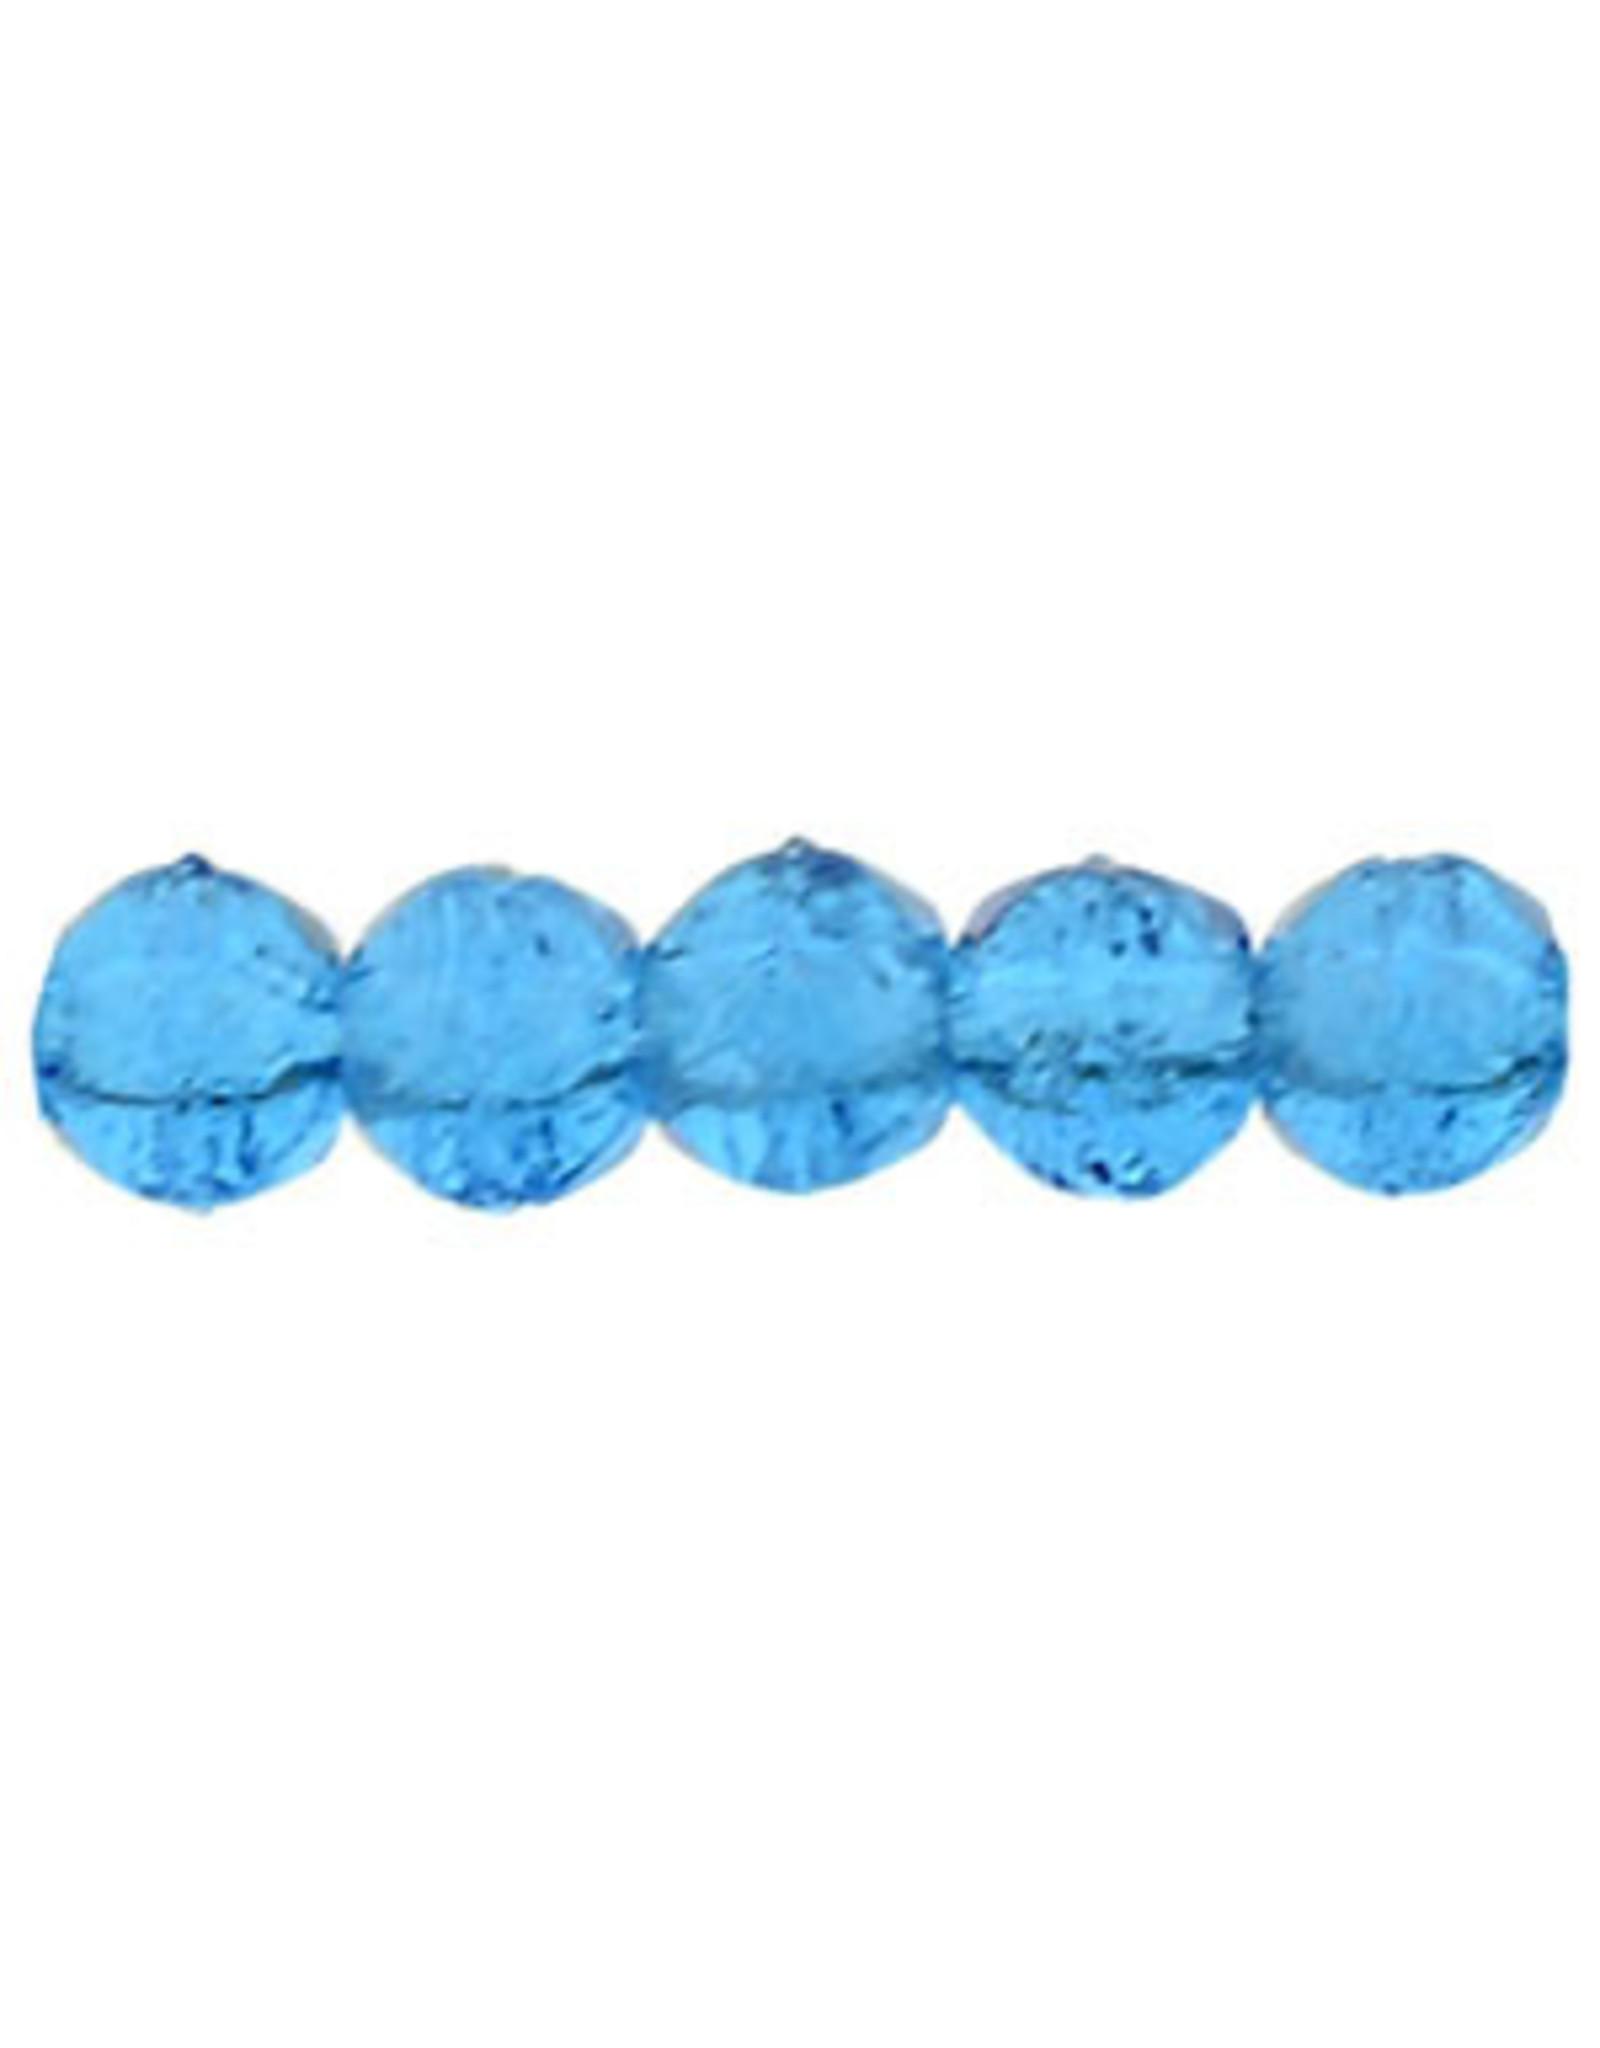 6008 3mm English Cut Capri Blue x50